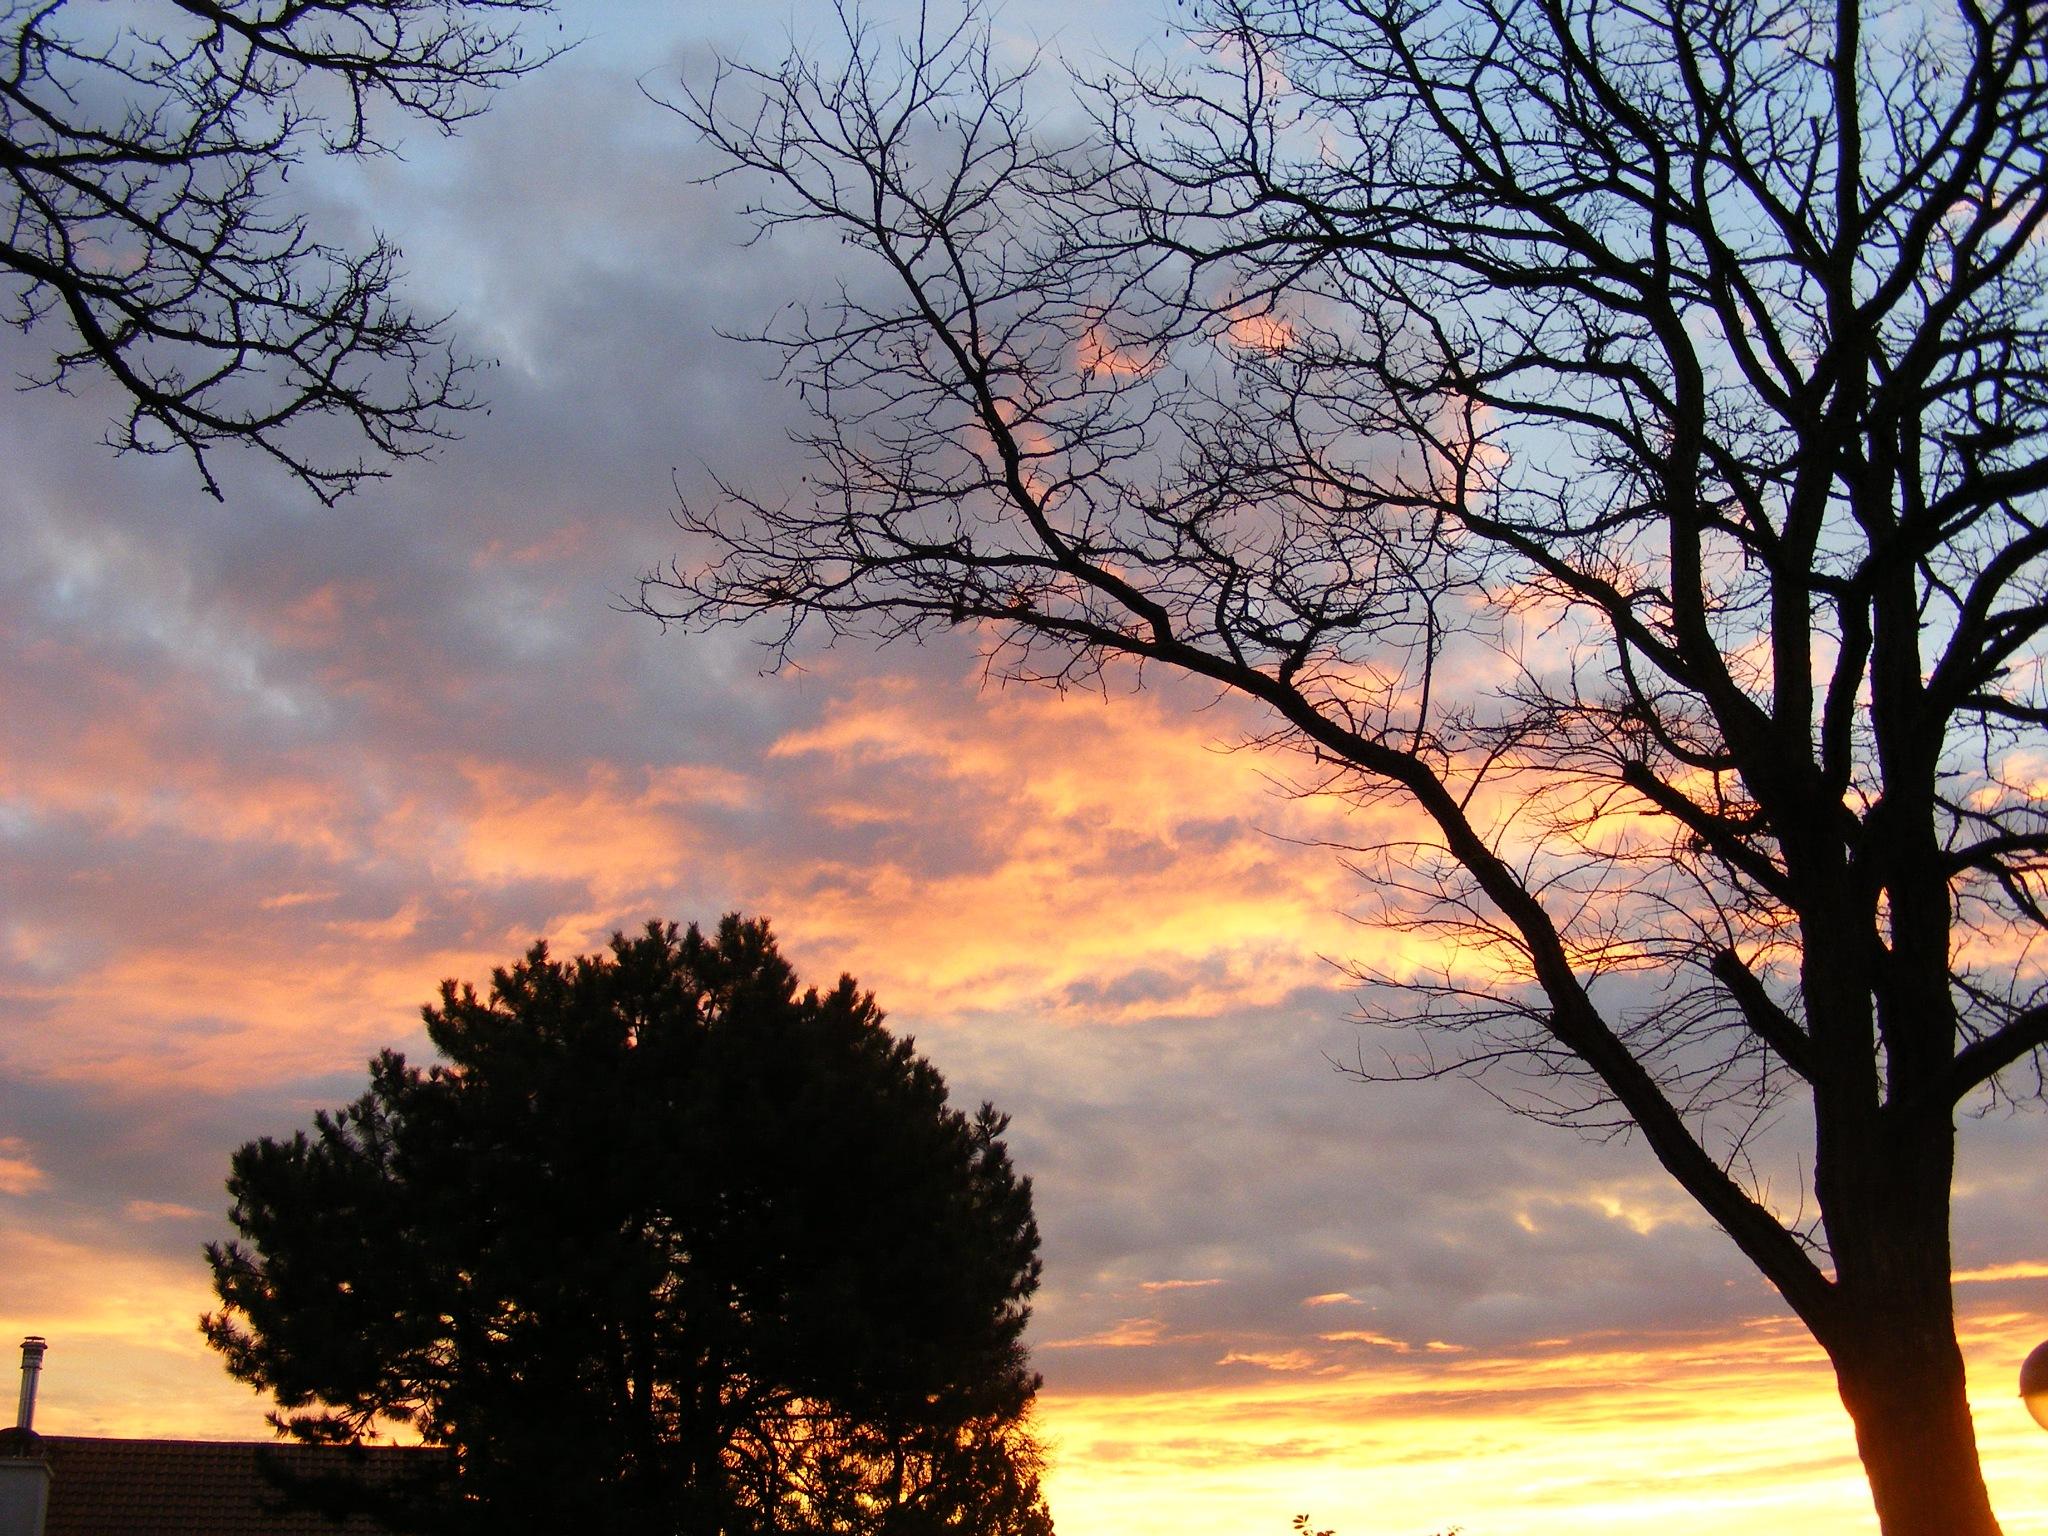 tramonto by swernthaler